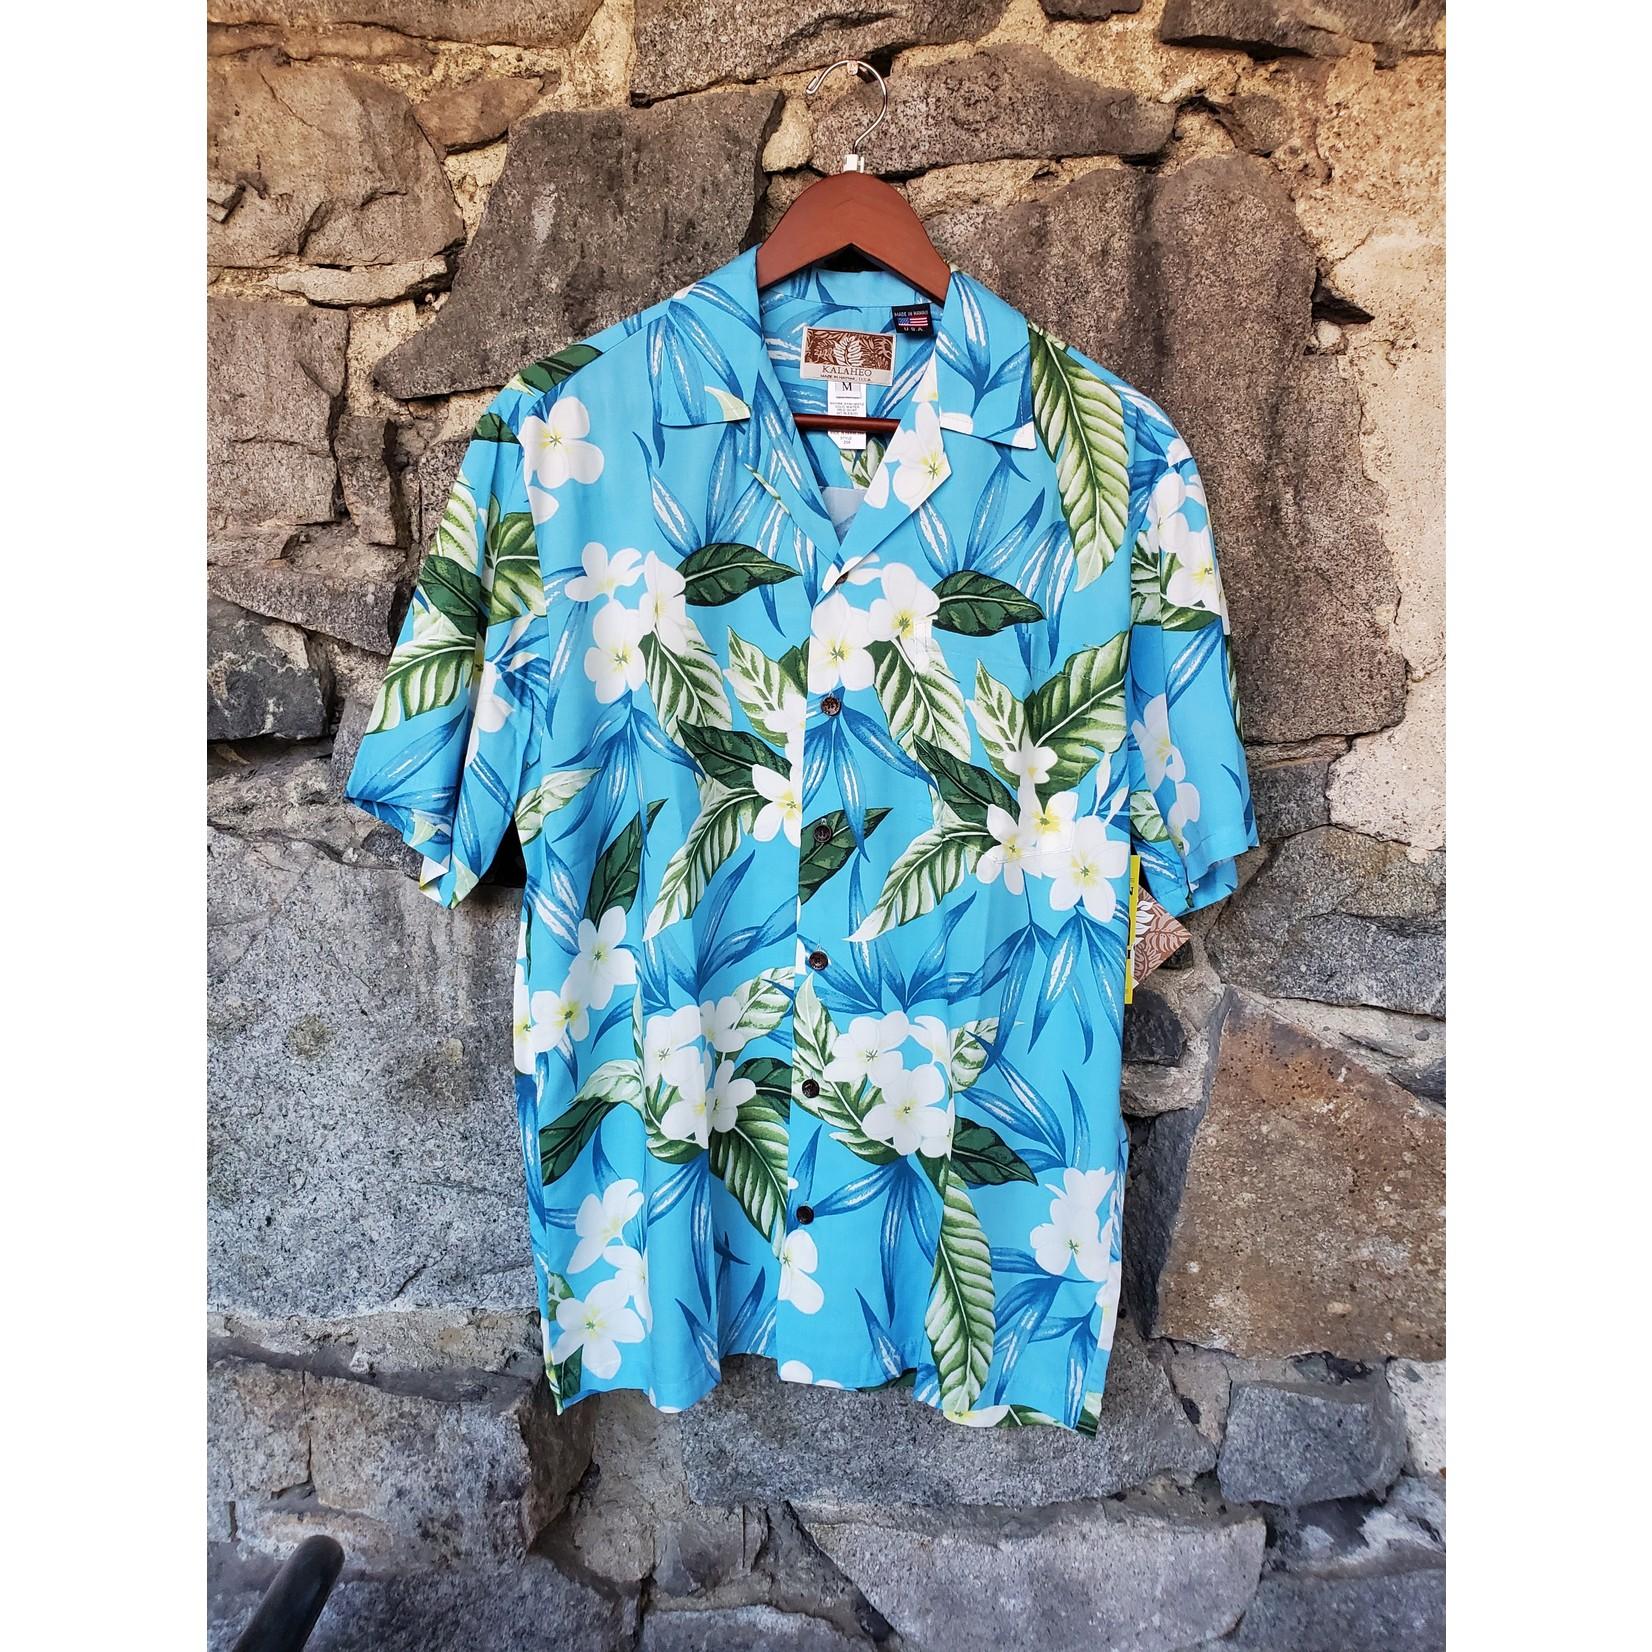 RJC Kalaheo Aloha Shirt - Turquoise Floral